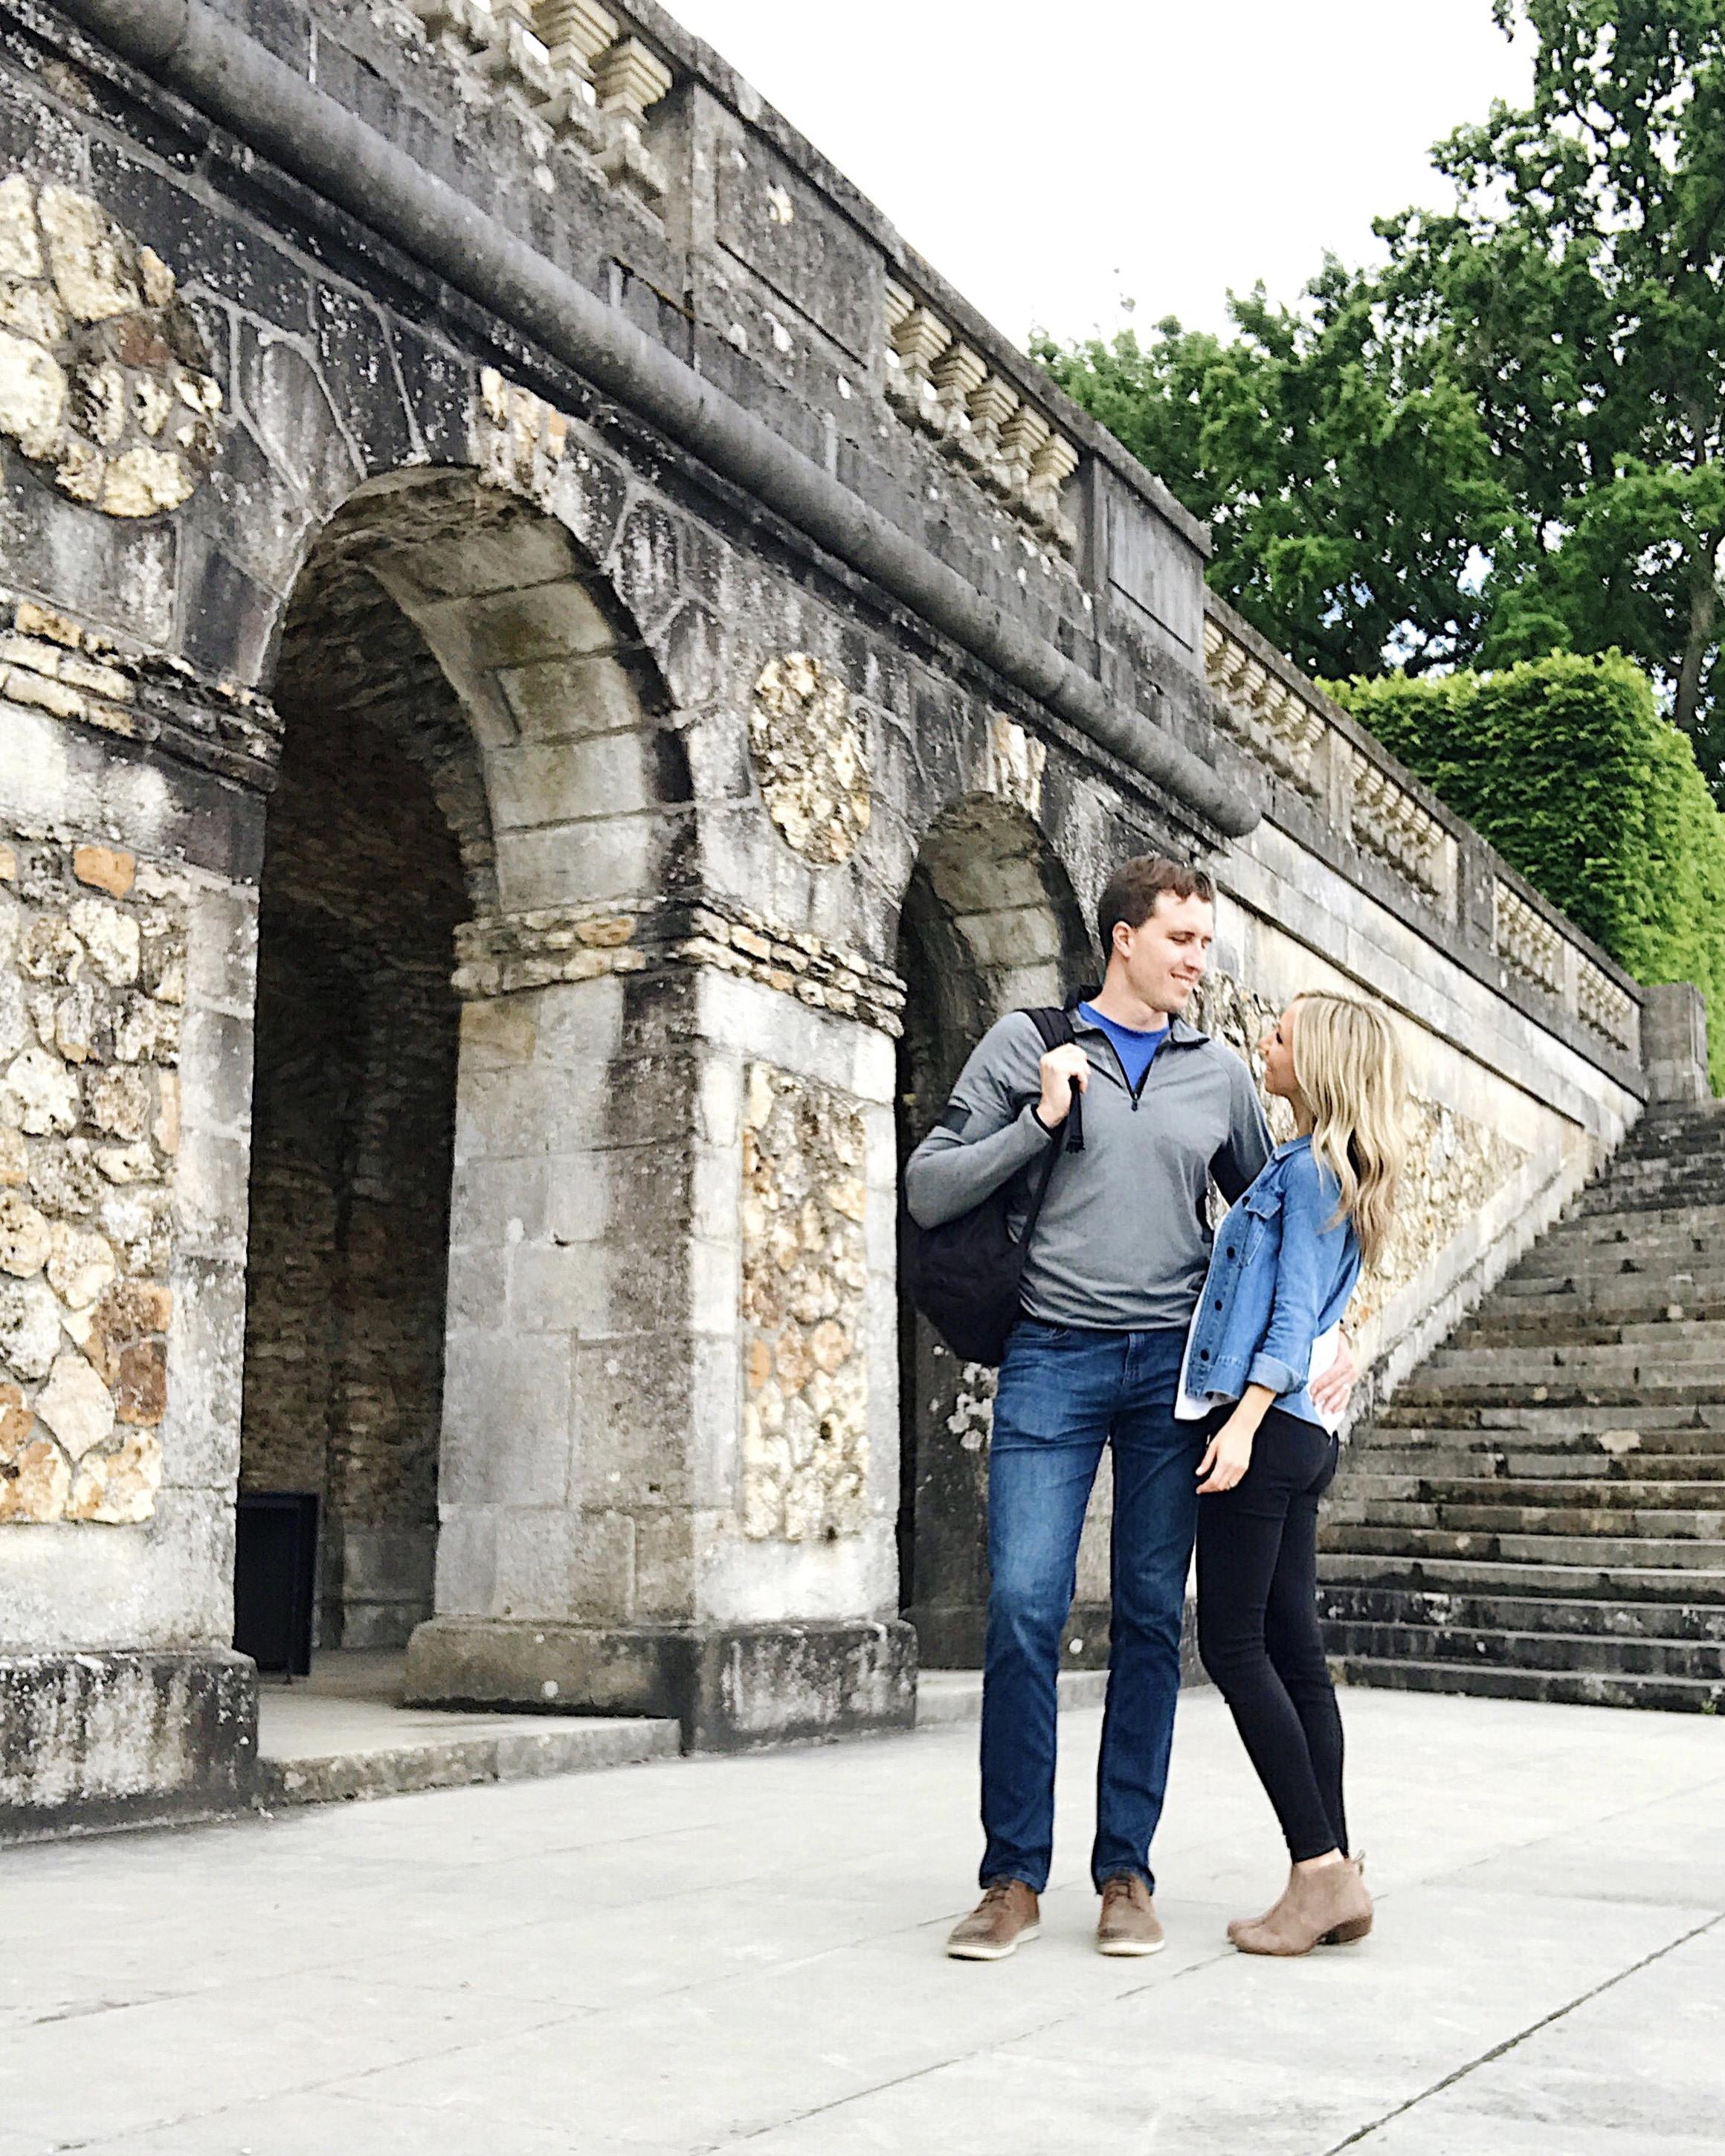 Visiting Chateau de Vaux le Vicomte outside of the city.